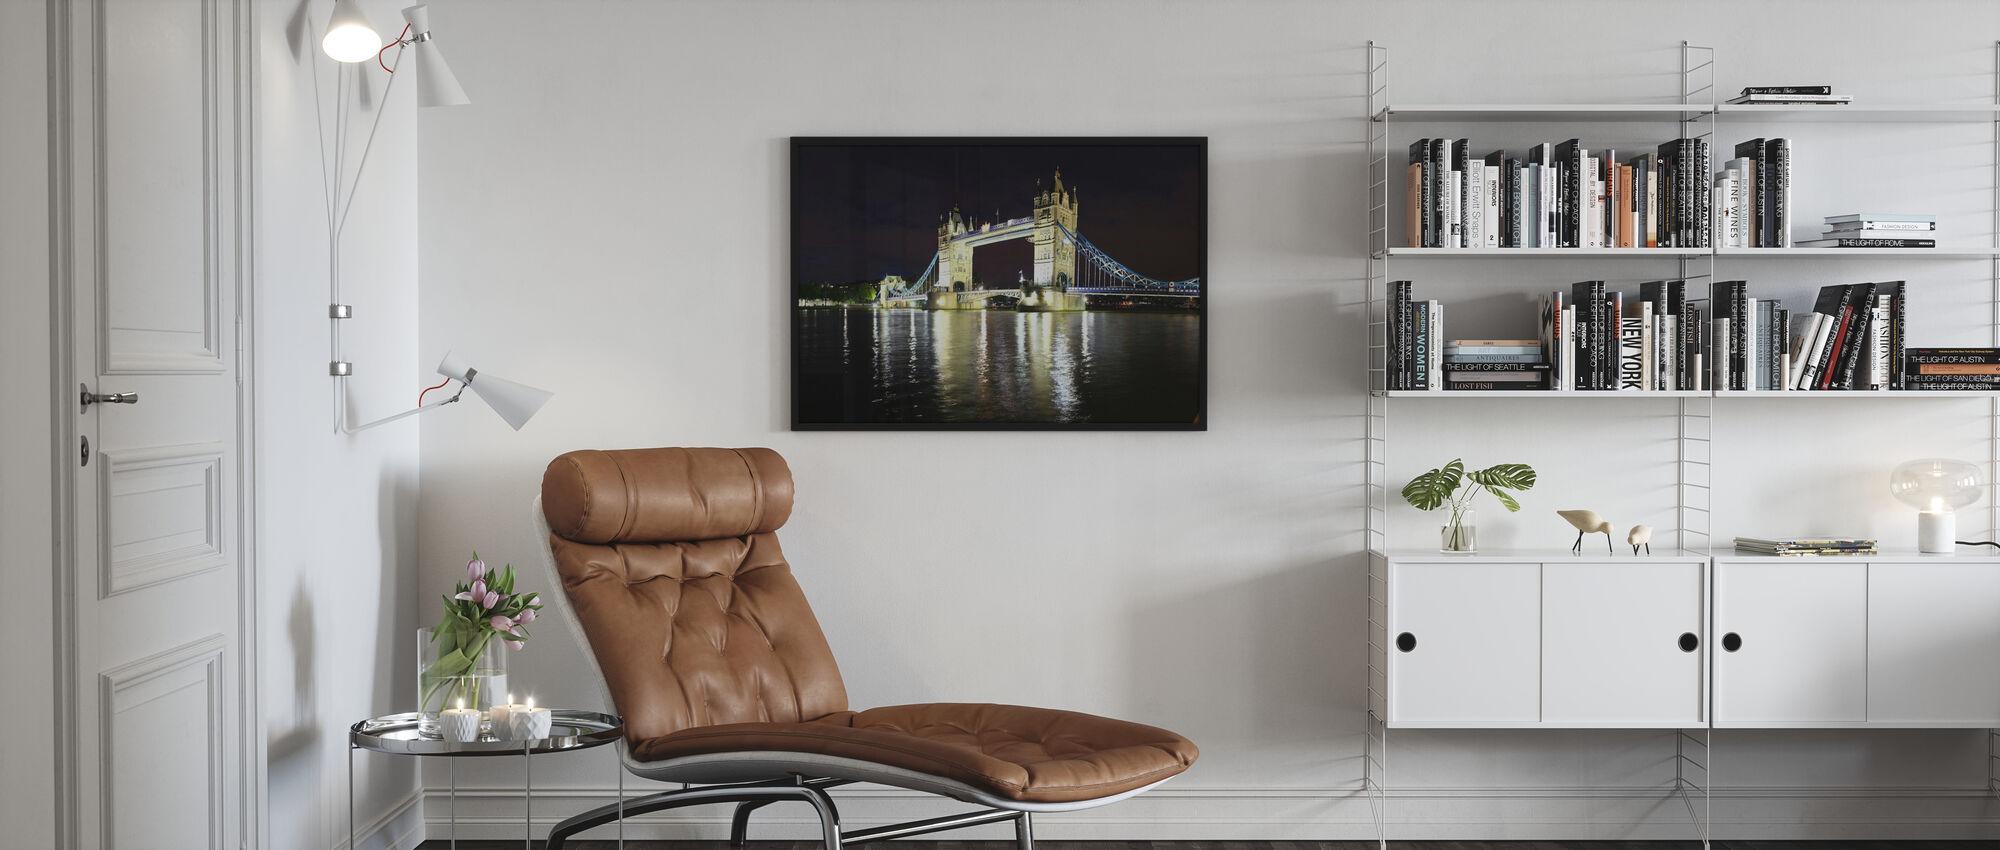 London Tower Bridge at Night - Framed print - Living Room